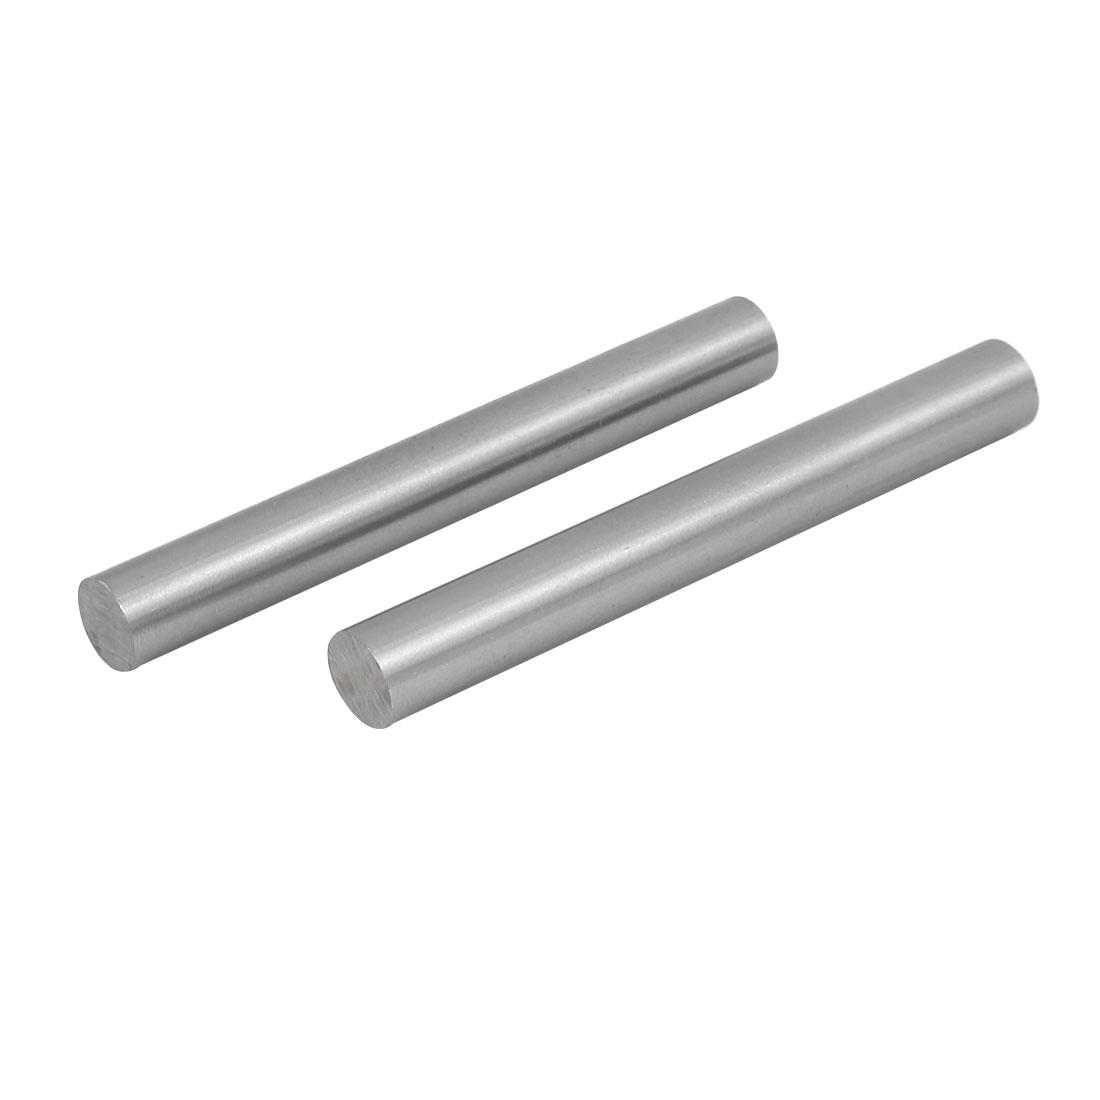 12mm Dia 100mm Length HSS Round Shaft Rod Bar Lathe Tools Gray 2pcs